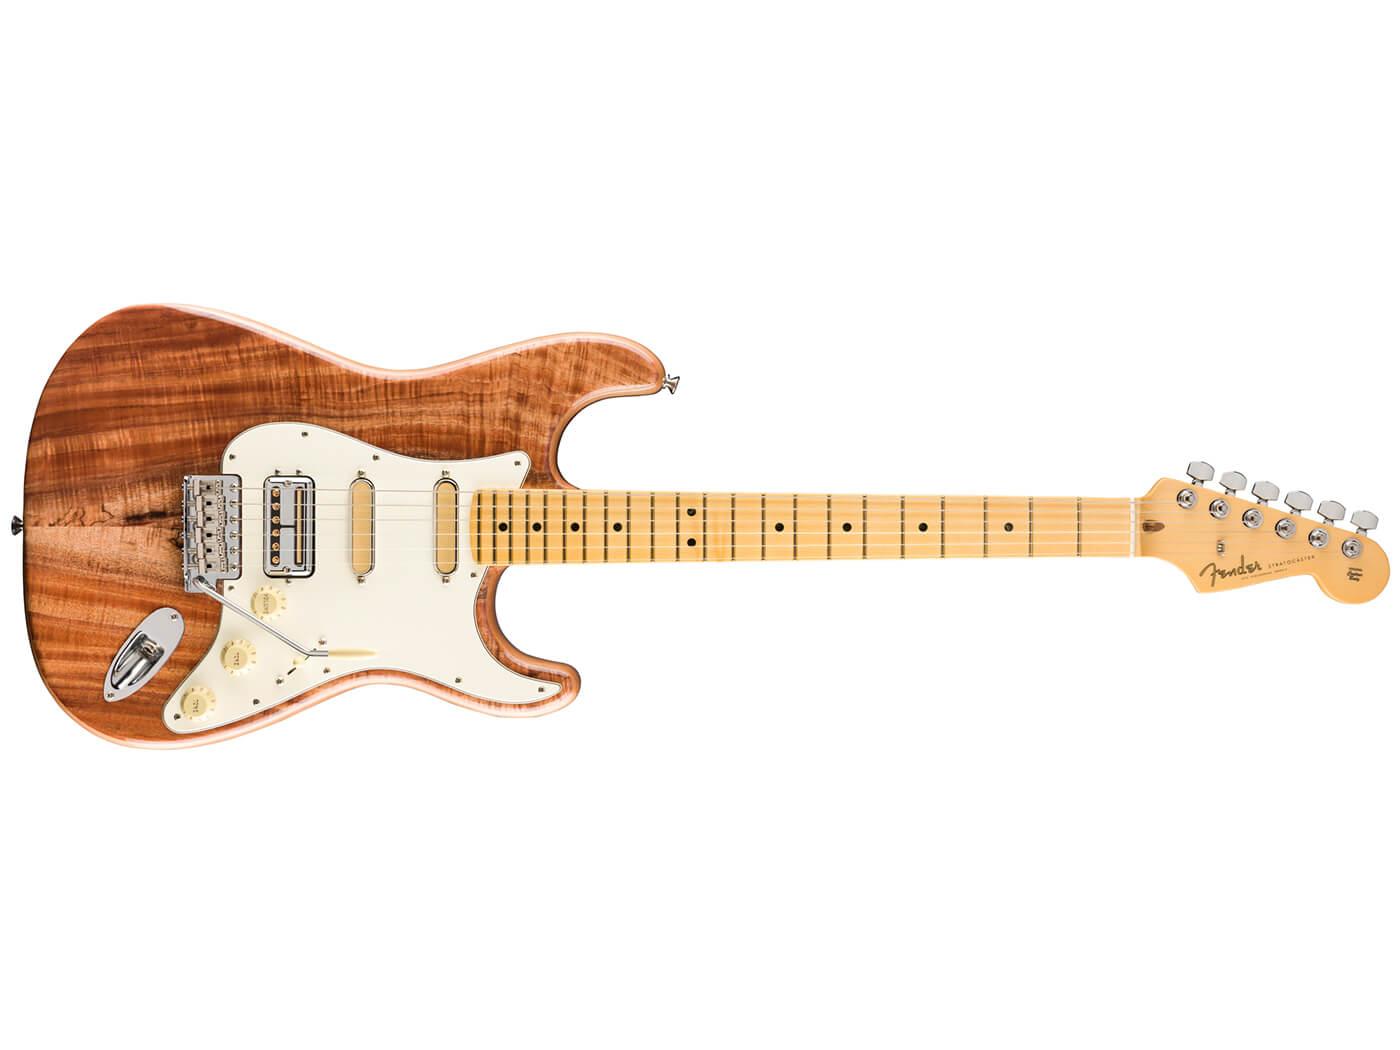 The Fender Koa Top Stratocaster